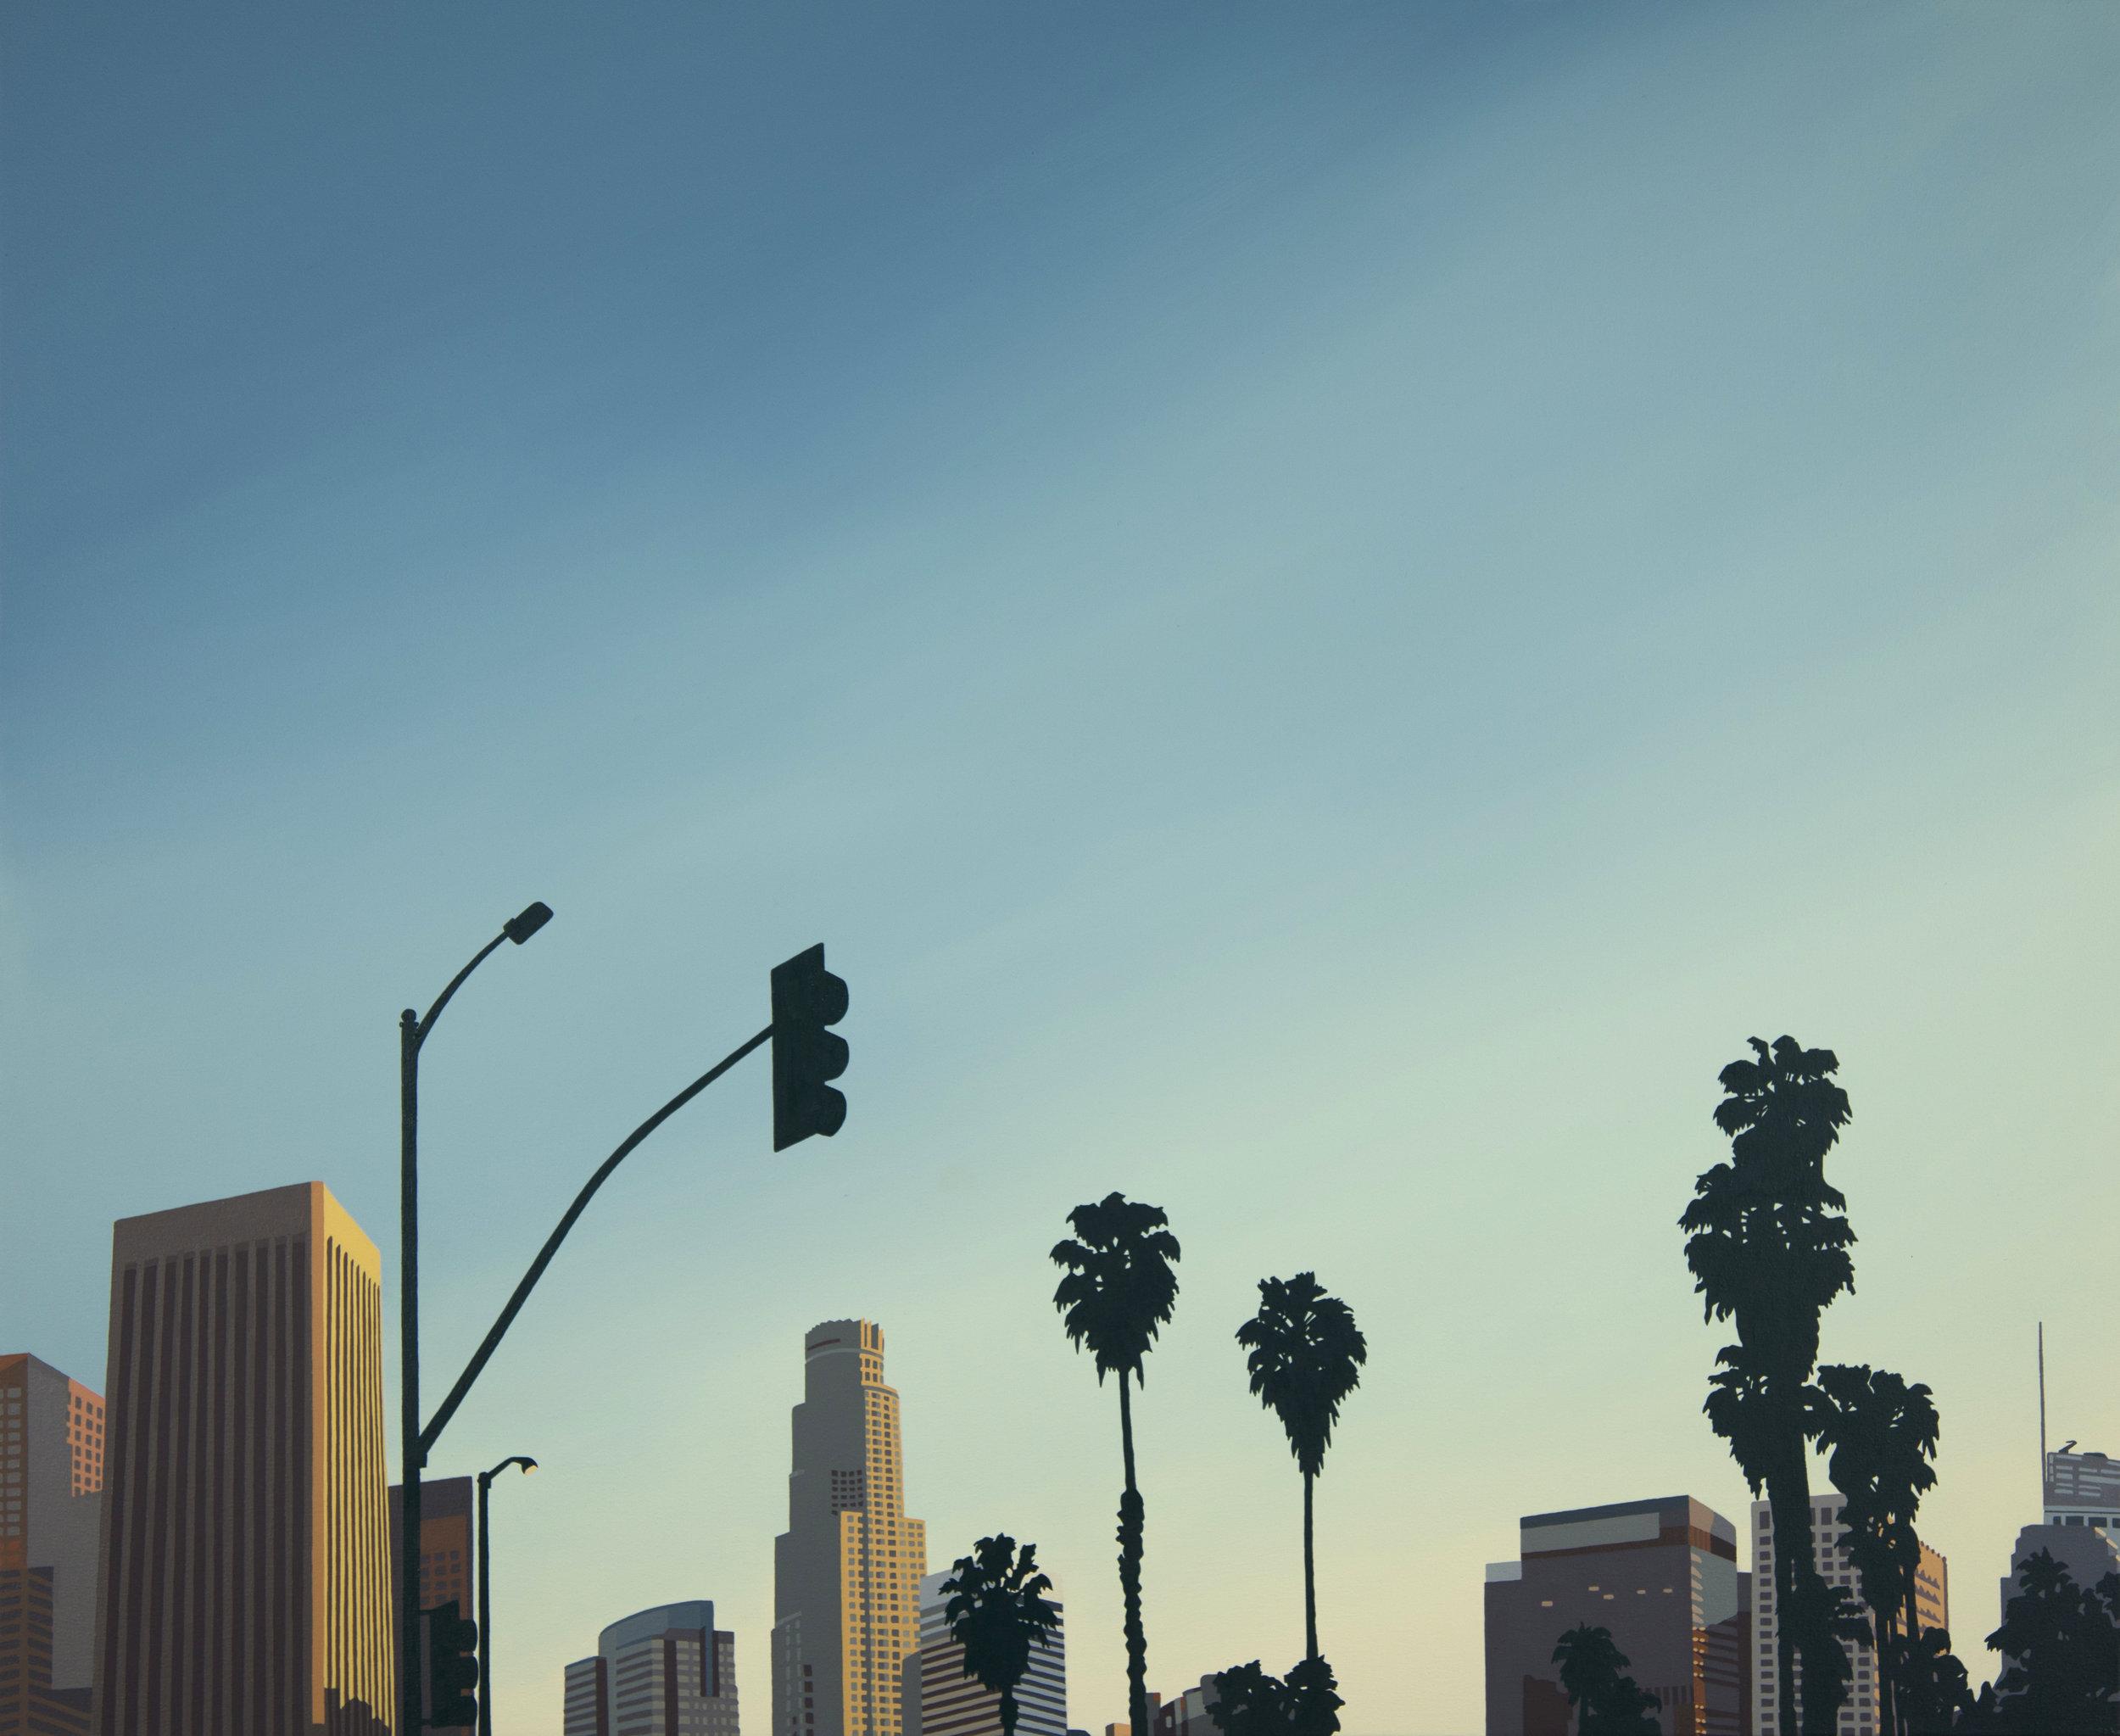 Skyline_36x44.jpg